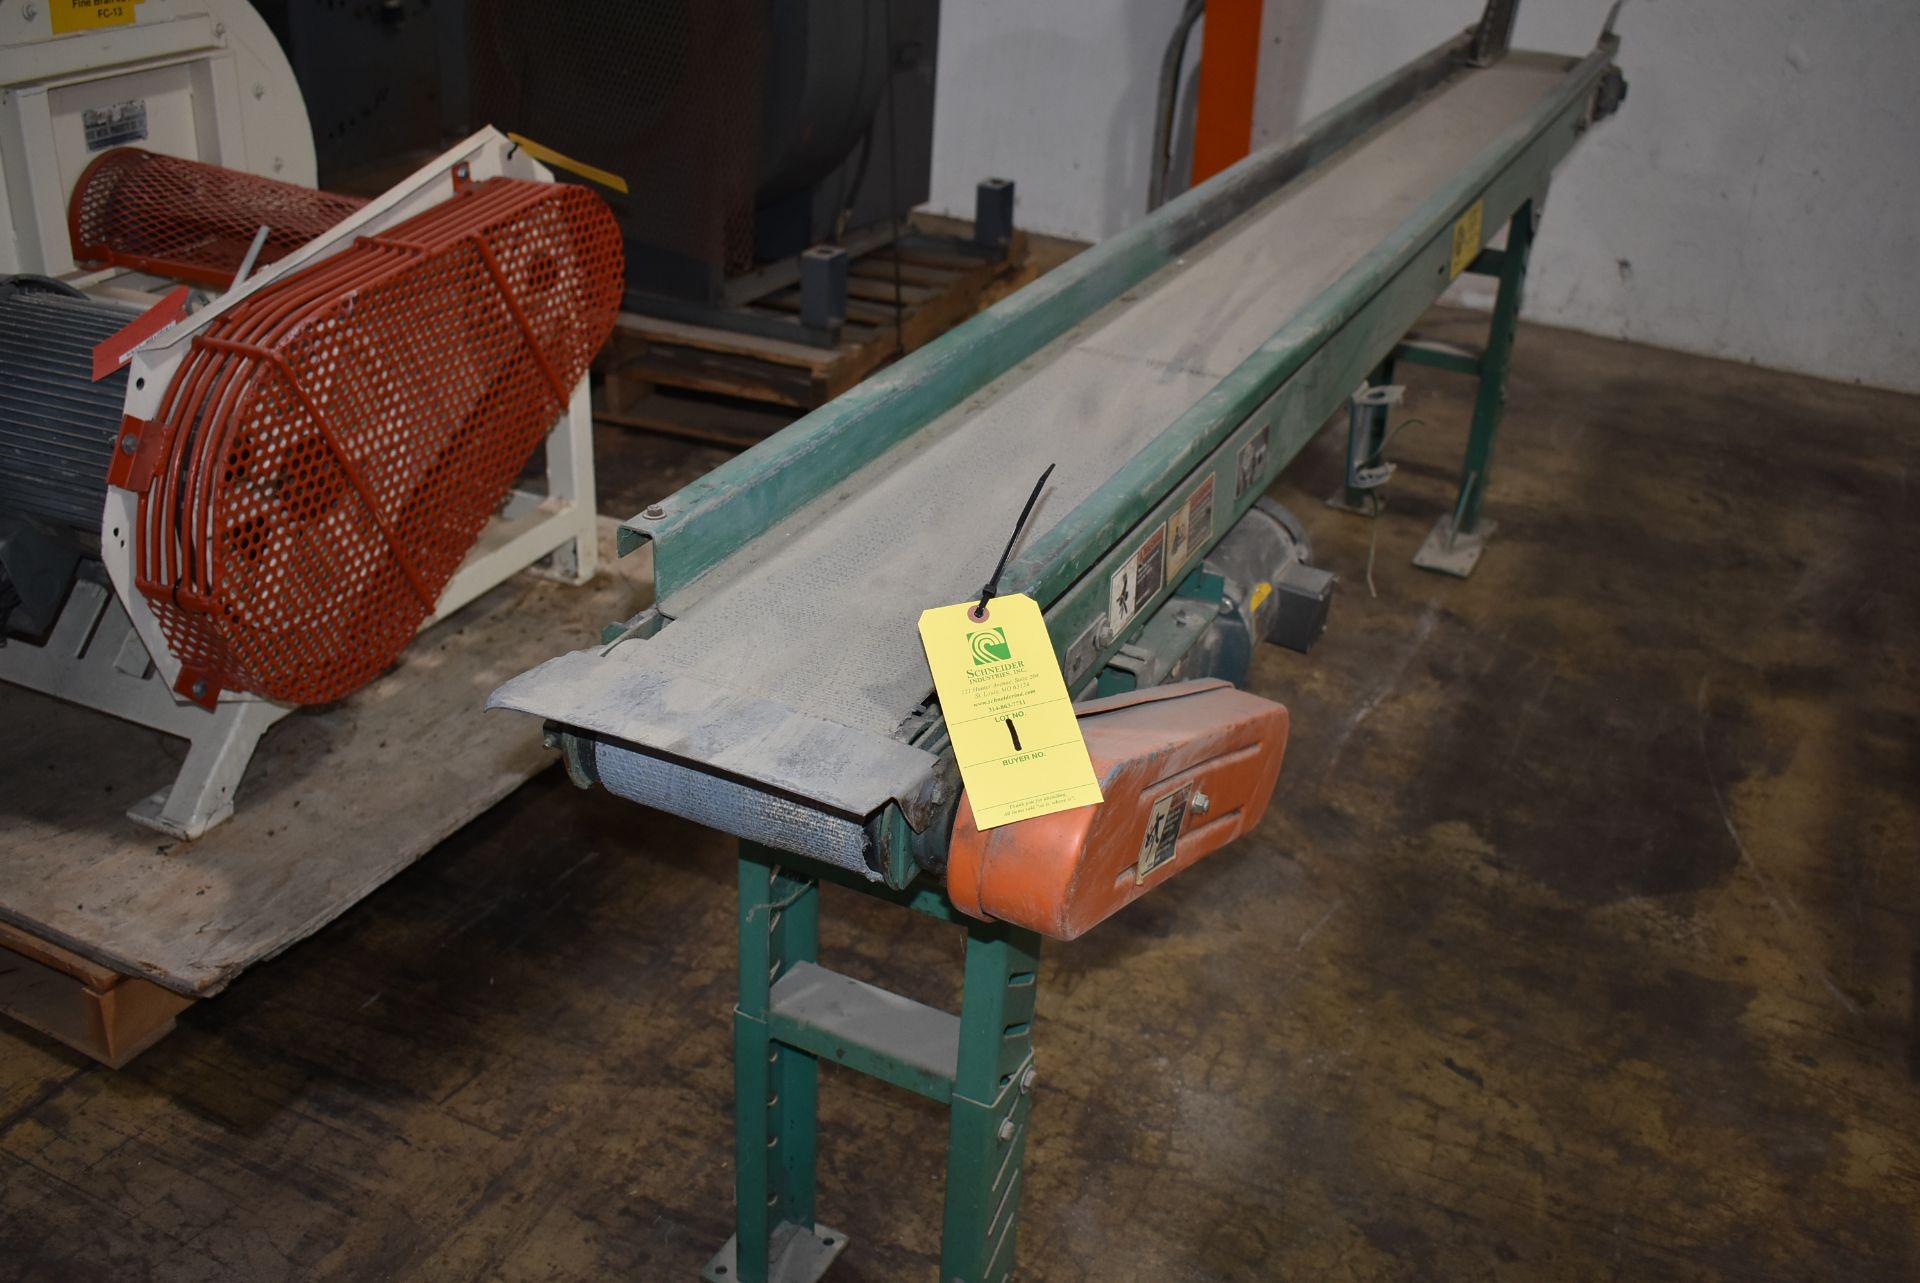 "Automated Conveyor Systems, Motorized Belt Conveyor, 8"" Wide Belt x 10' Length, Adjustable Leg Base - Image 2 of 2"